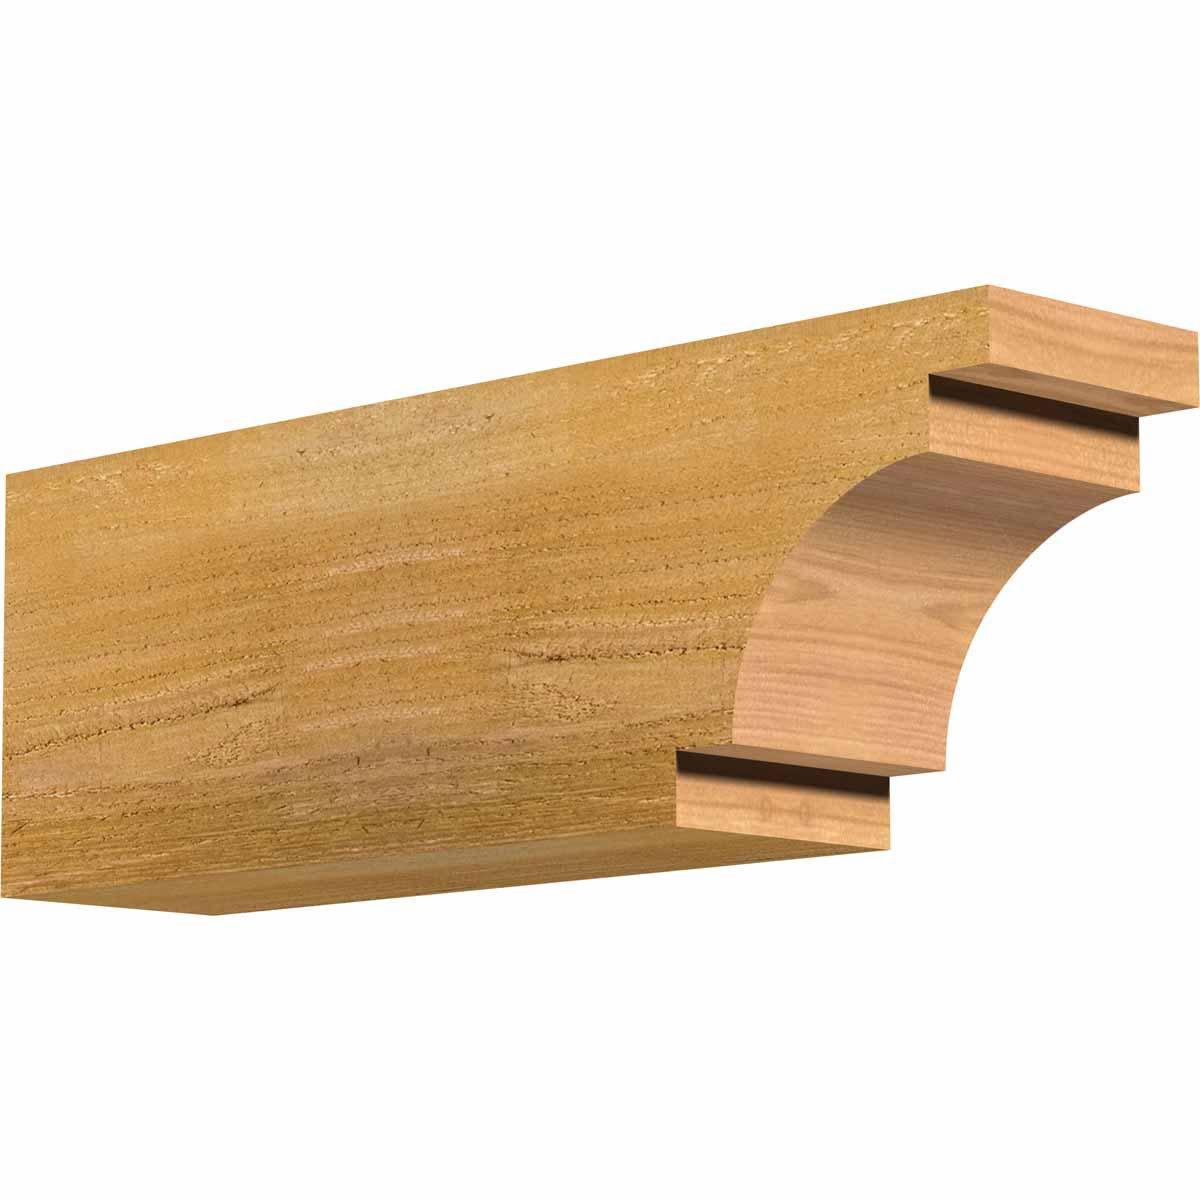 4 Width by 6 Height by 18 Length Western Red Cedar Ekena Millwork RFT04X06X18MED00RWR Mediterranean Rough Sawn Rafter Tail